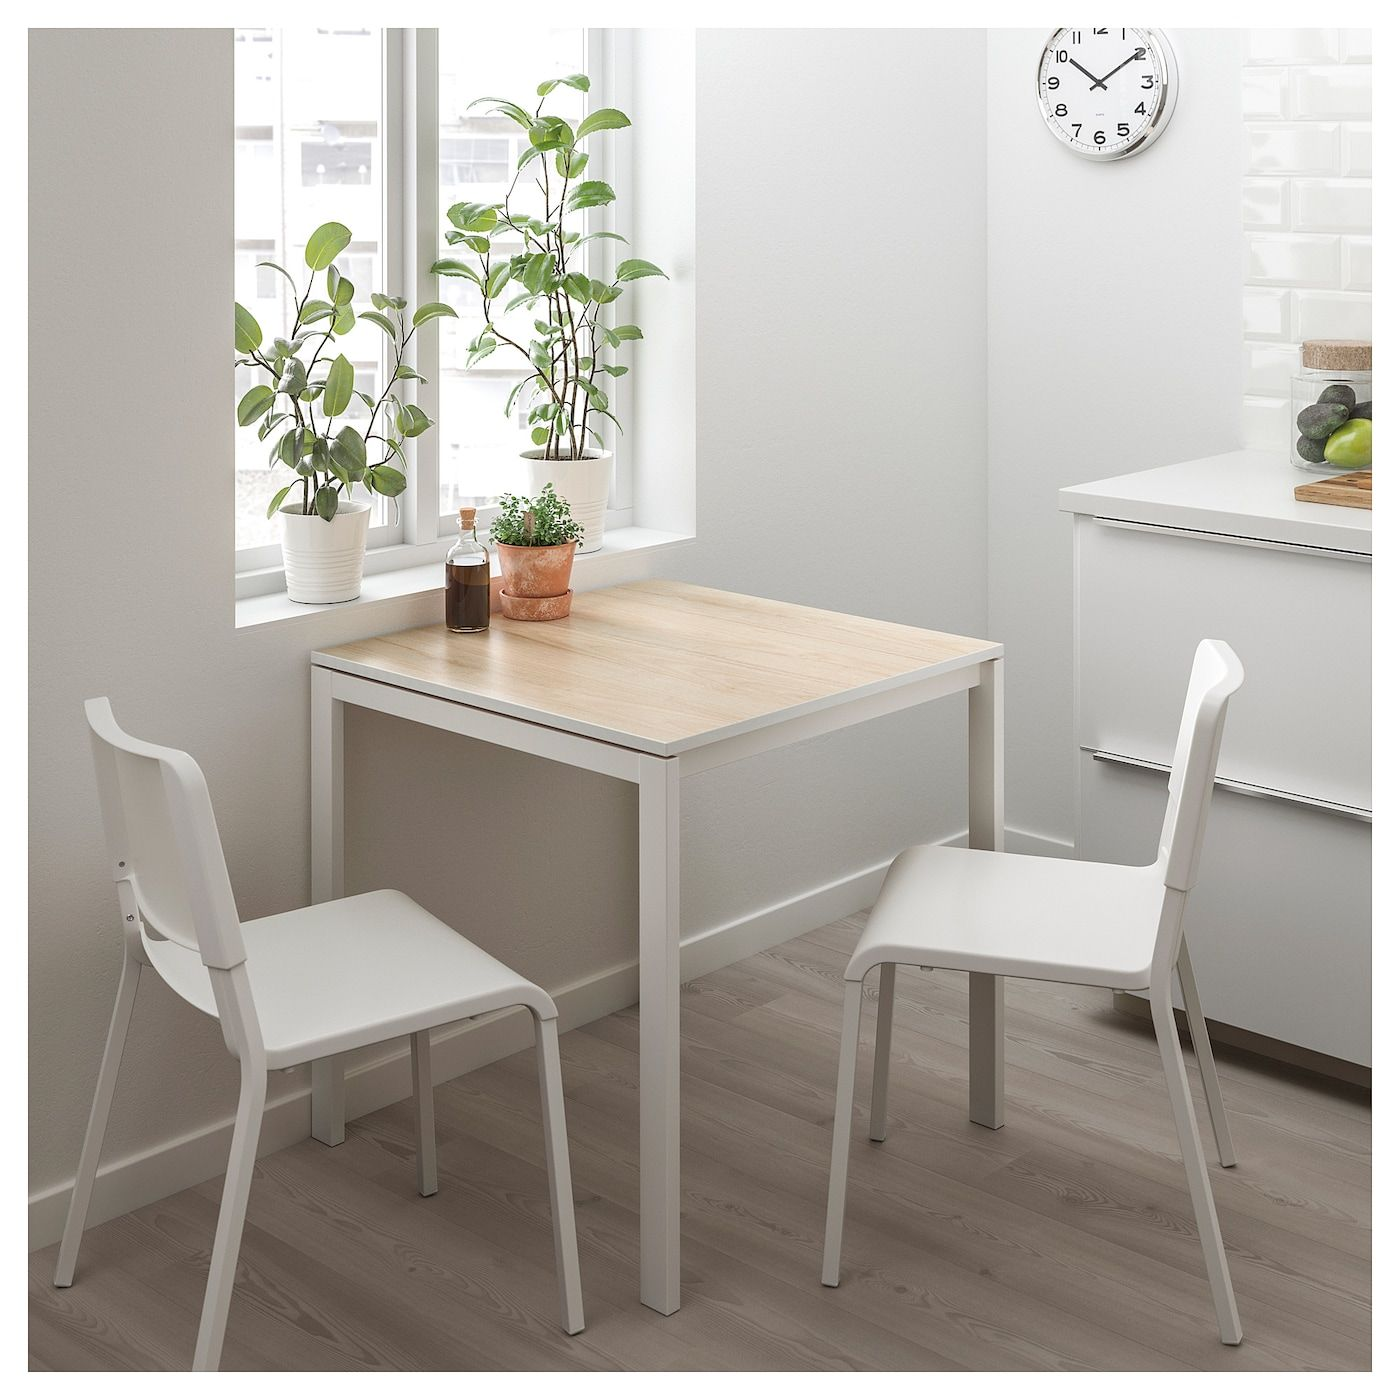 Tavolo Ikea Bianco.Melltorp Teodores Tavolo E 2 Sedie Frassino Bianco